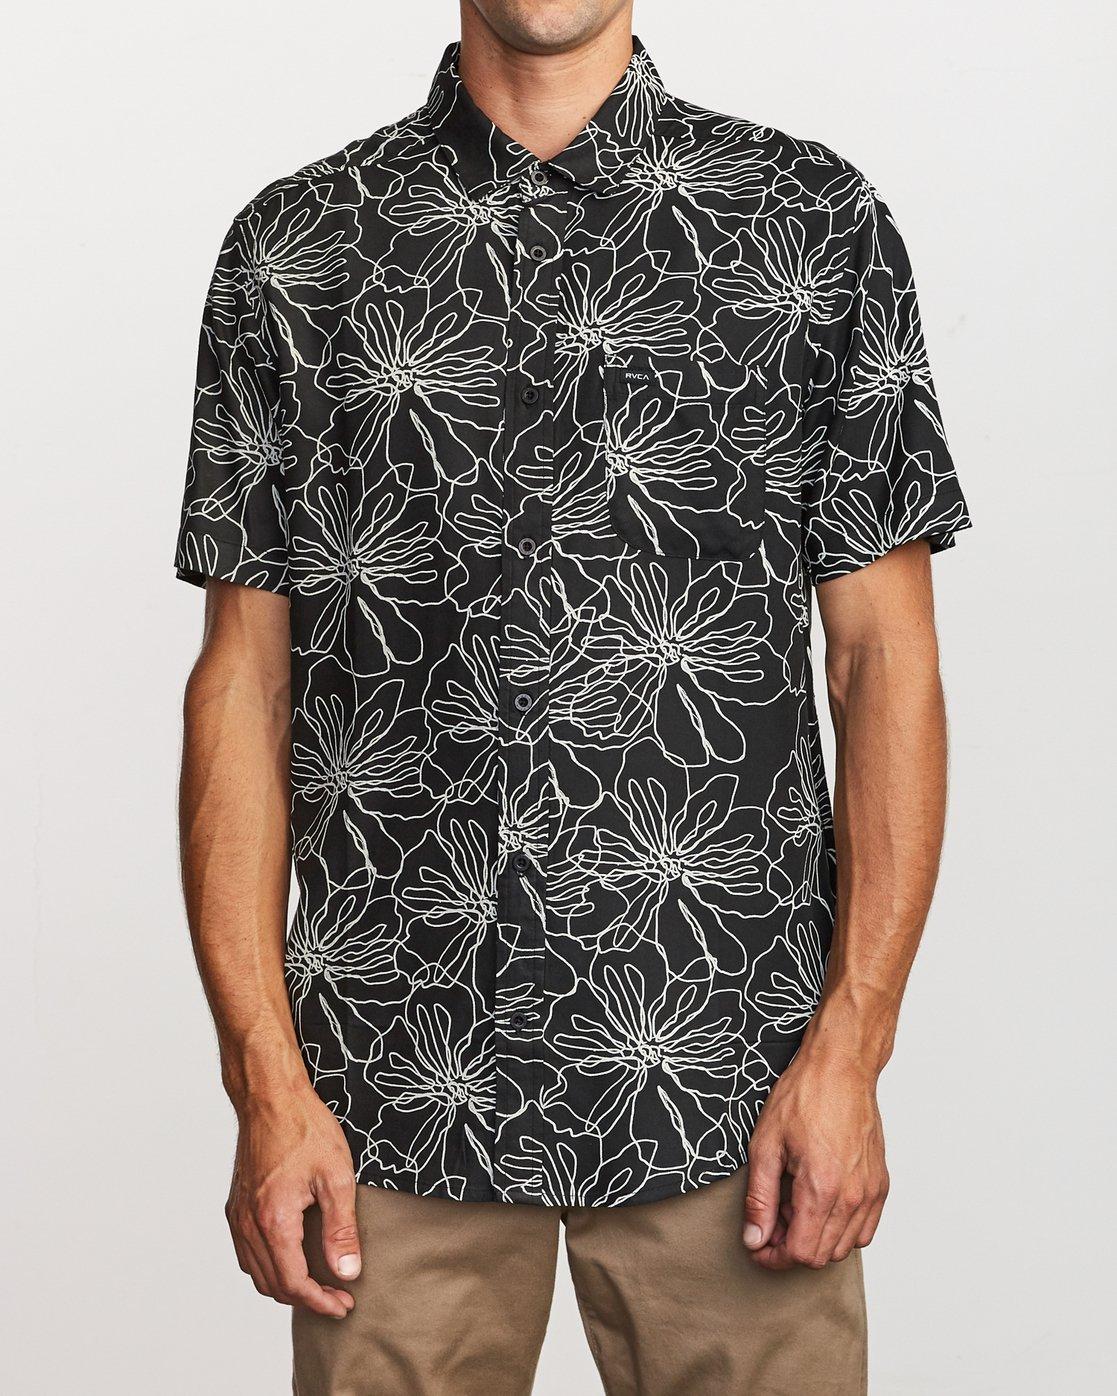 1 Blind Floral Button-Up Shirt Black M506VRBF RVCA